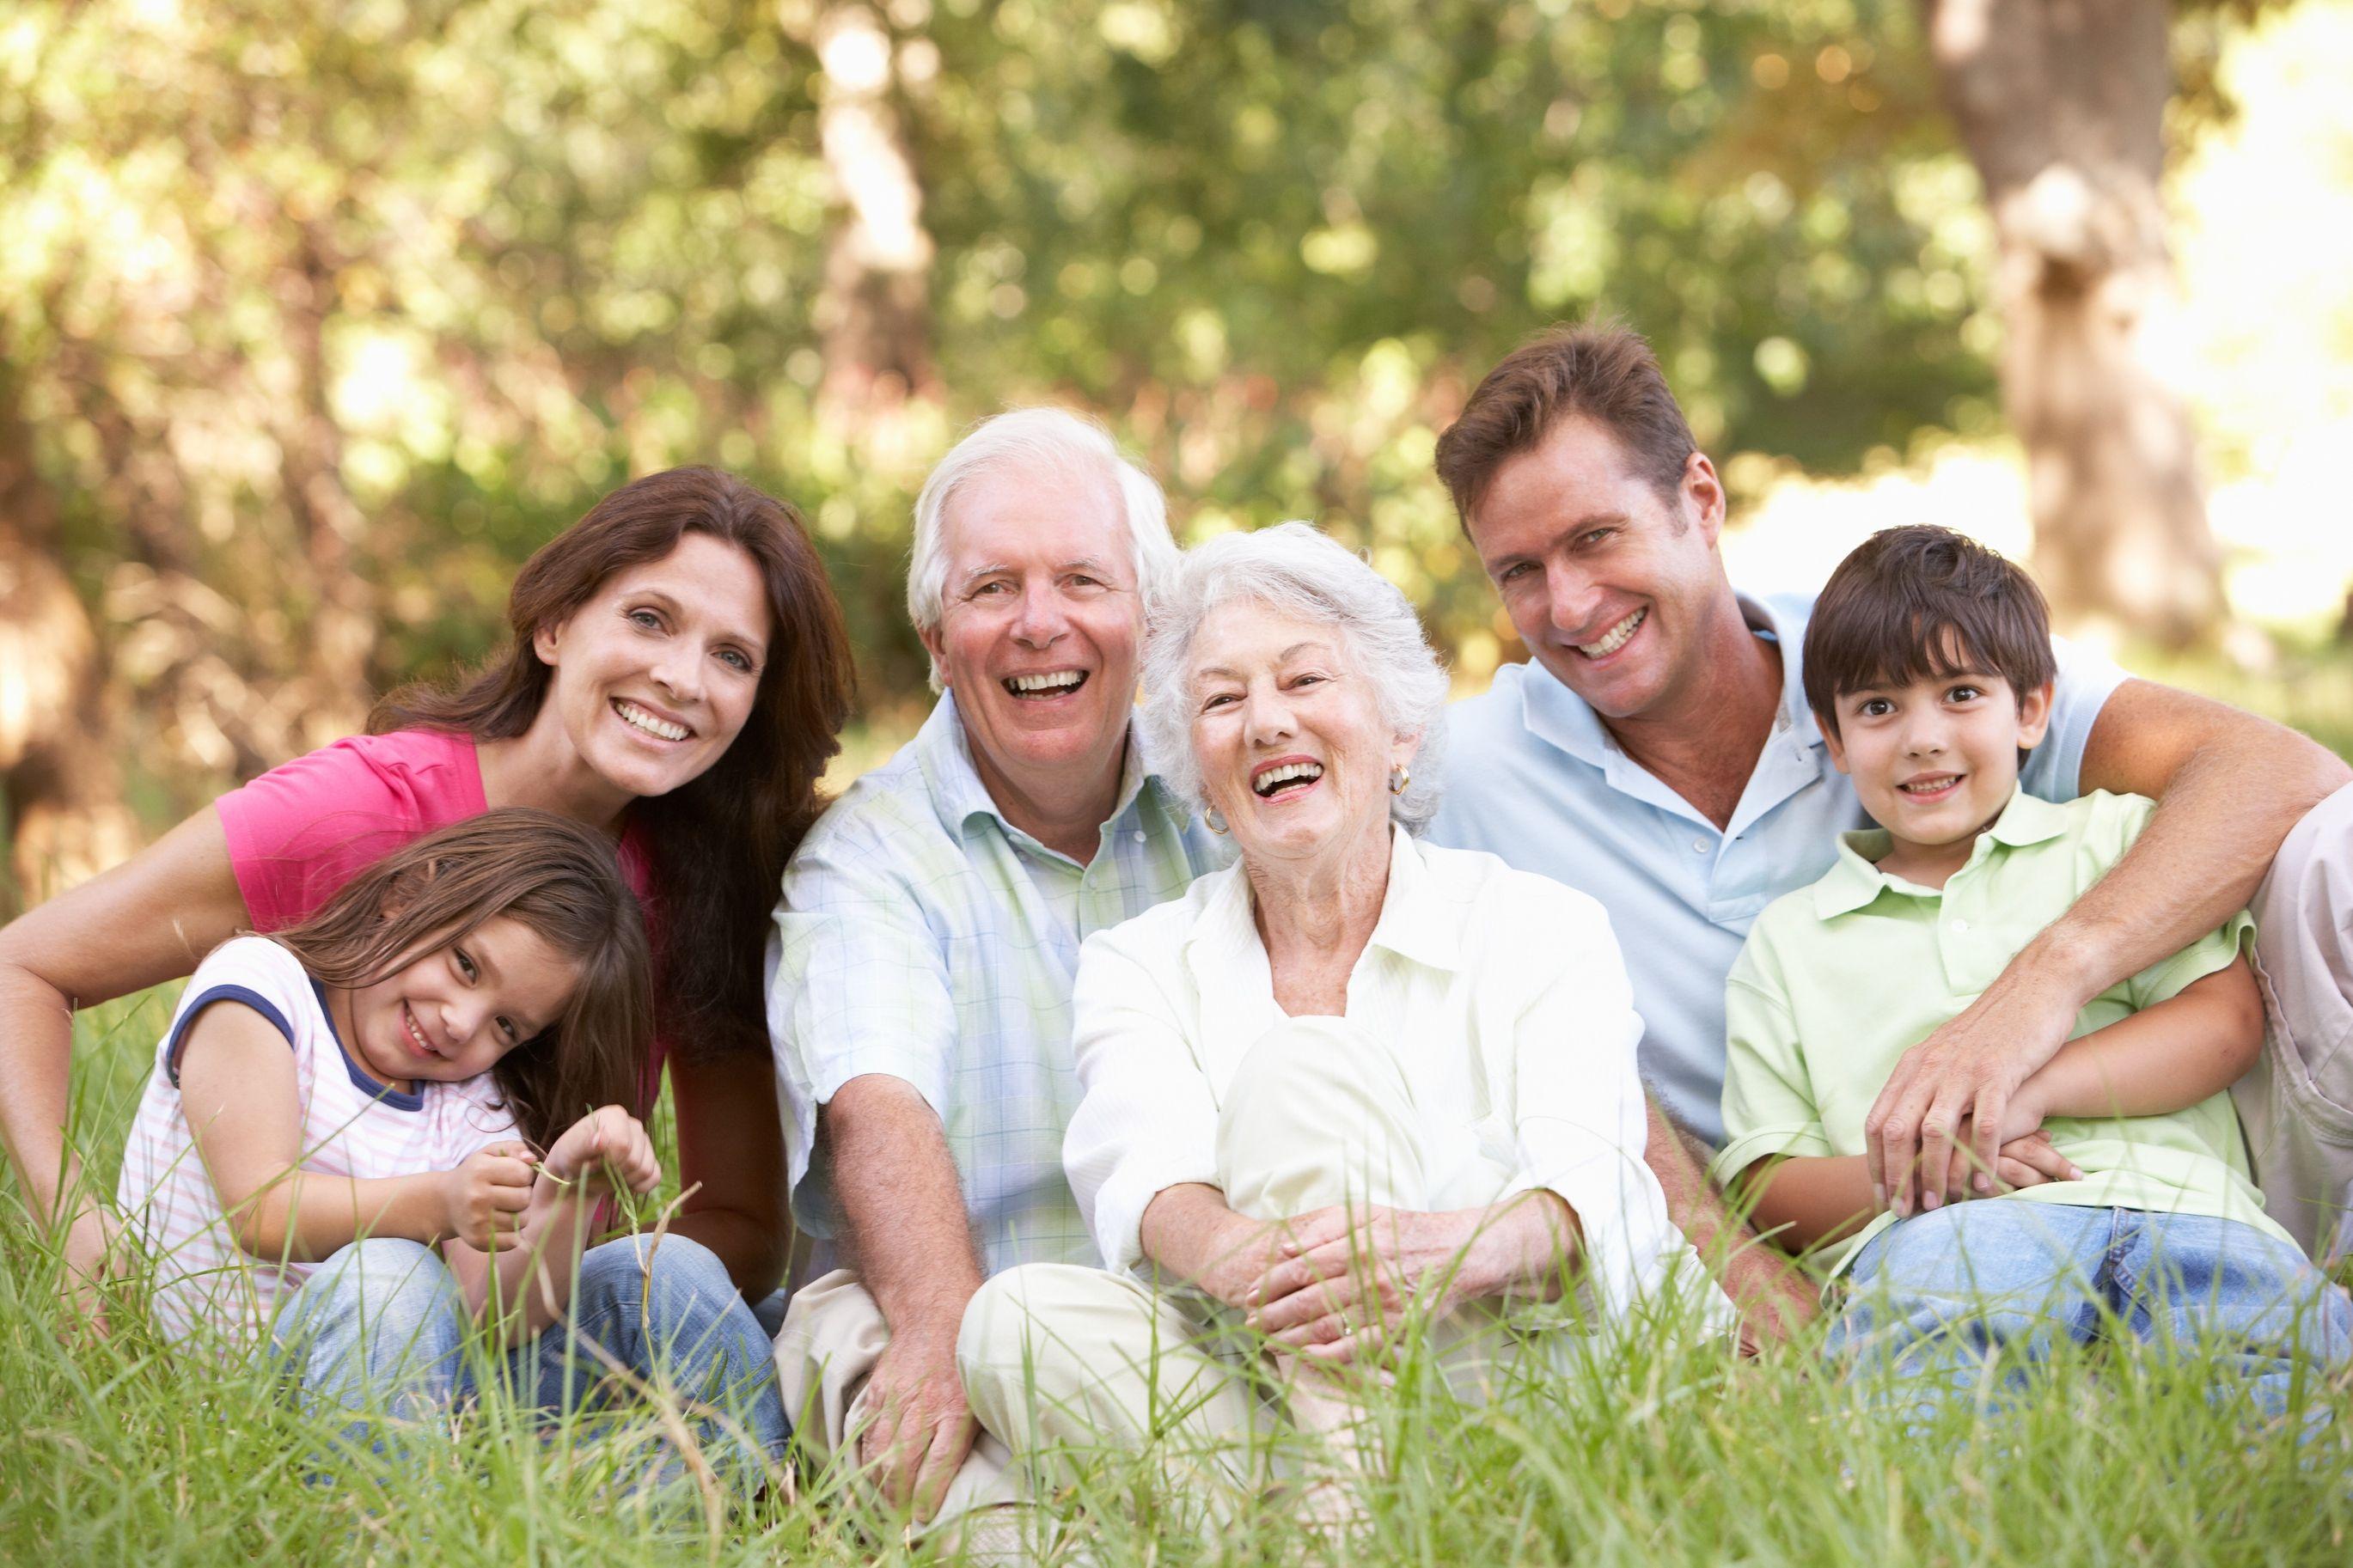 Family Photo Images Of Grandparents Family Grandparents Dreamstime L 14692336